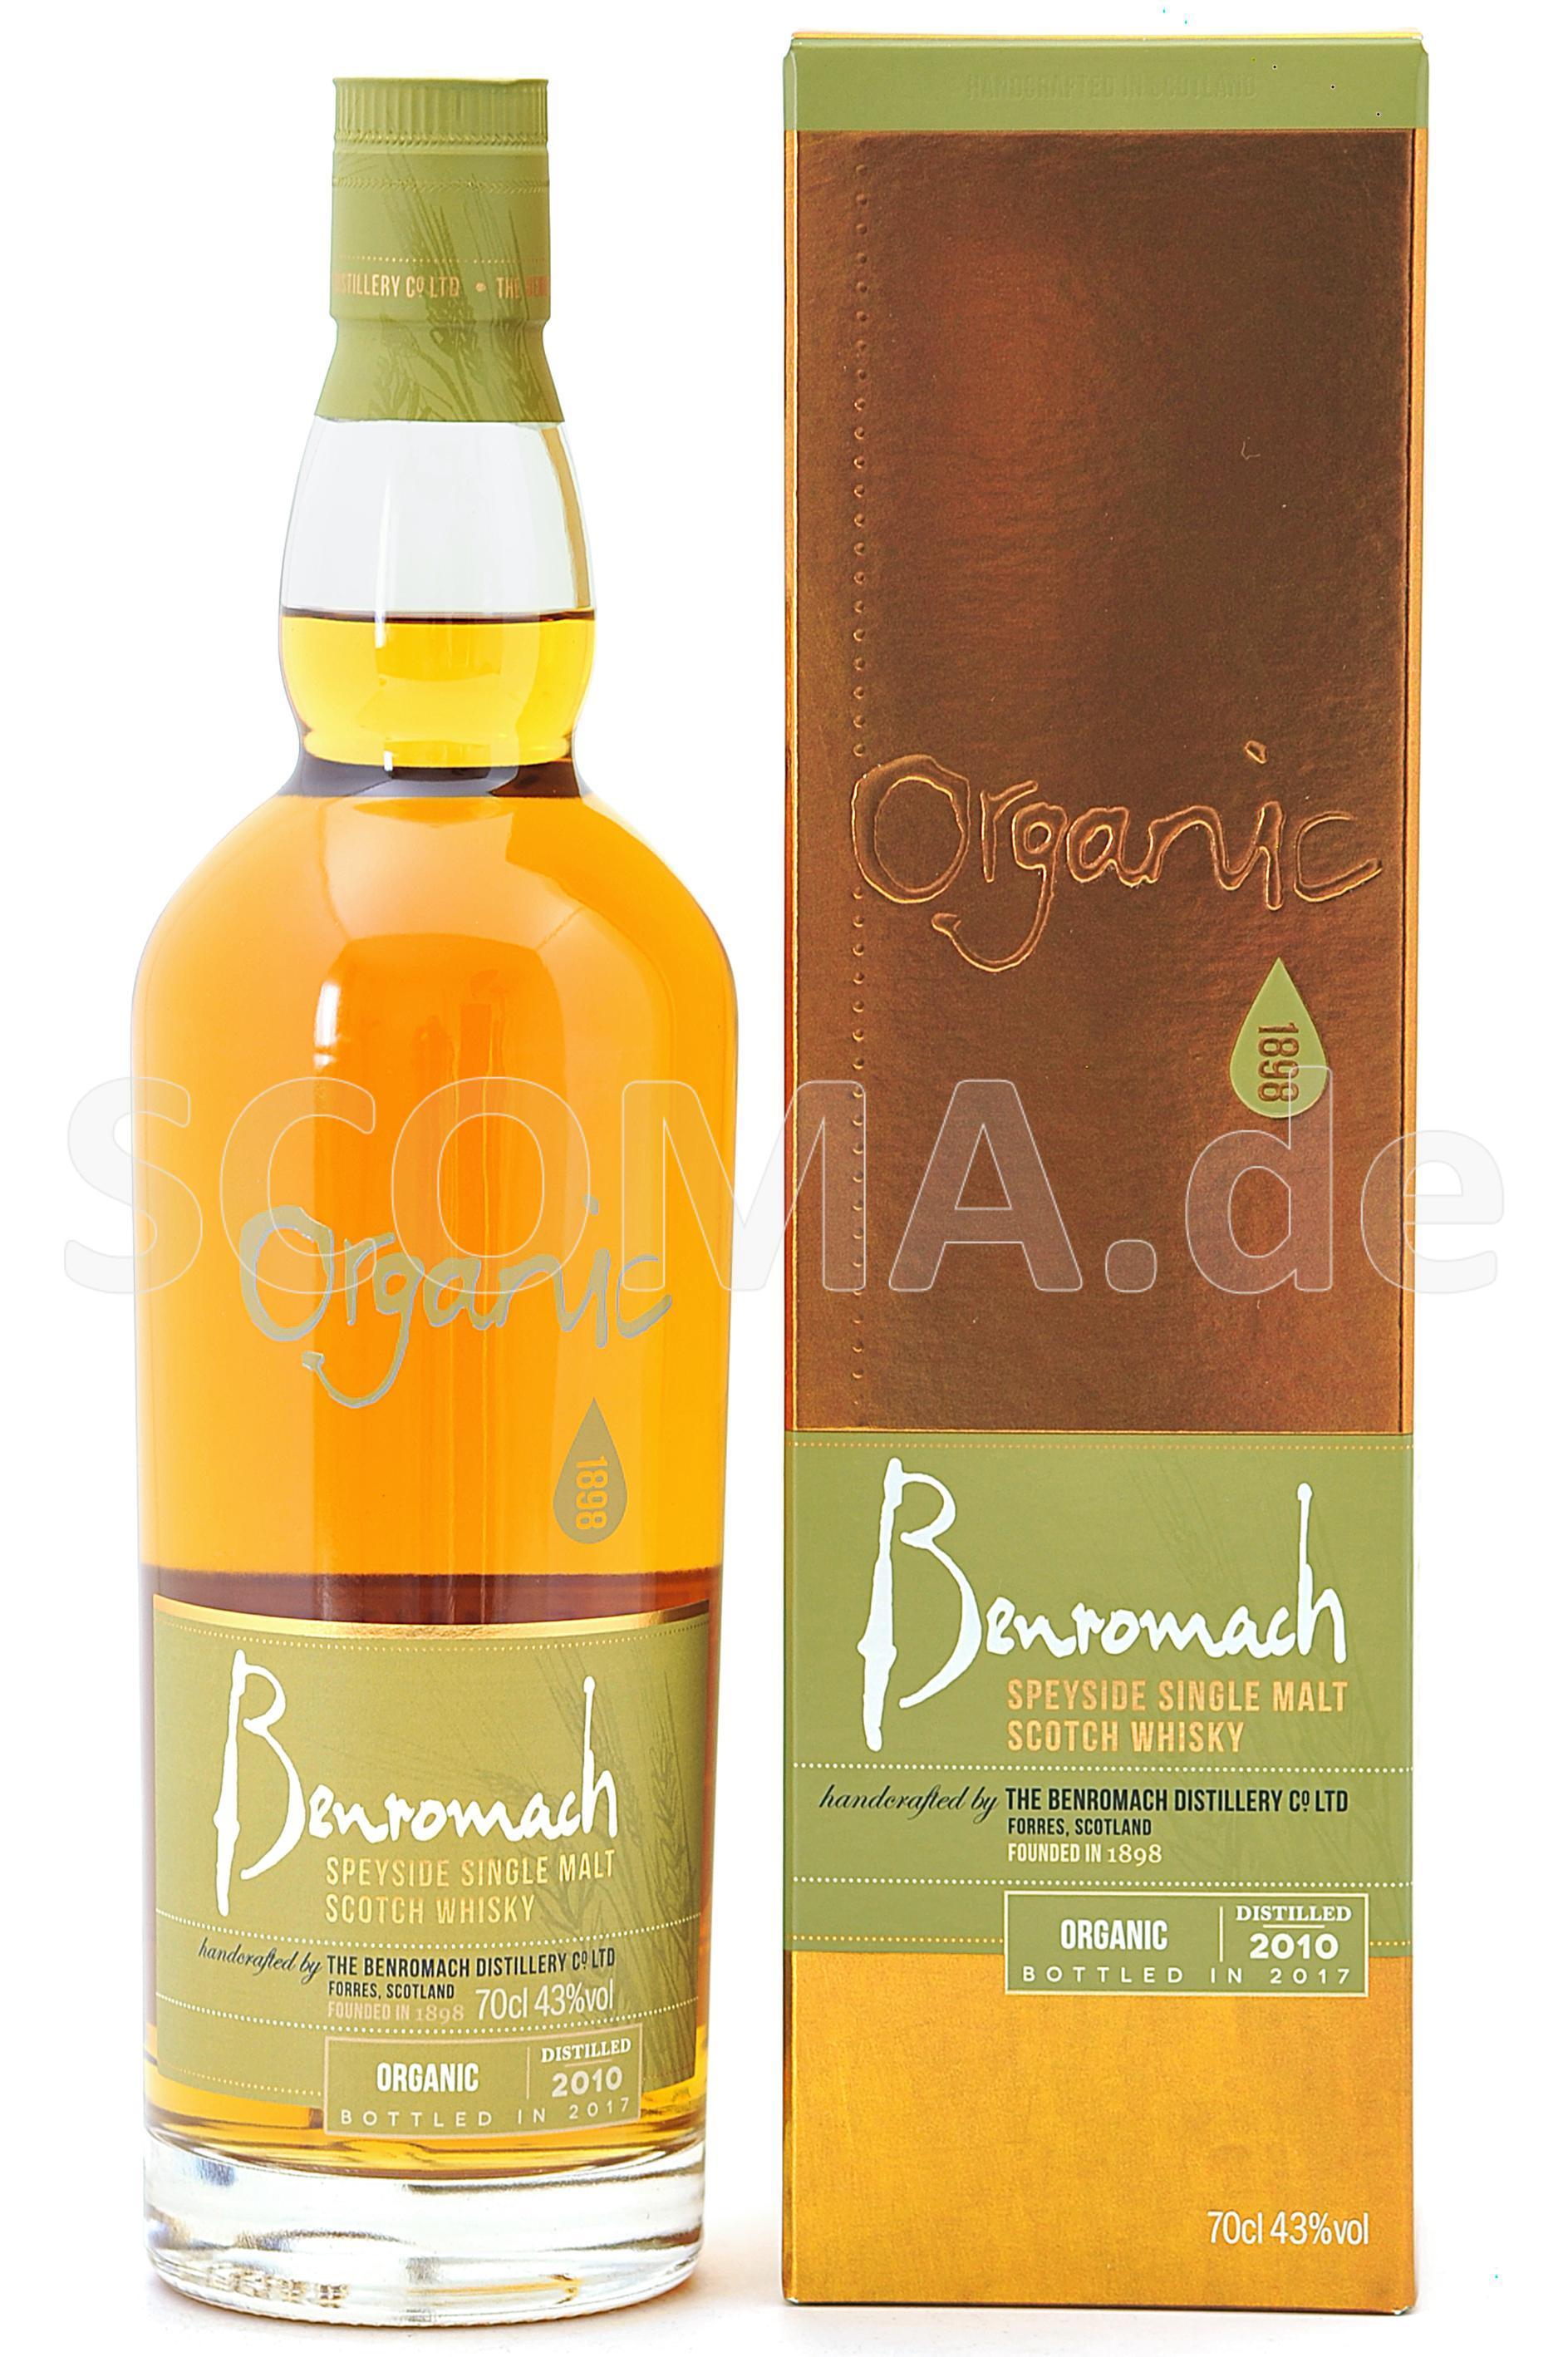 Benromach 2010/2017 Organic